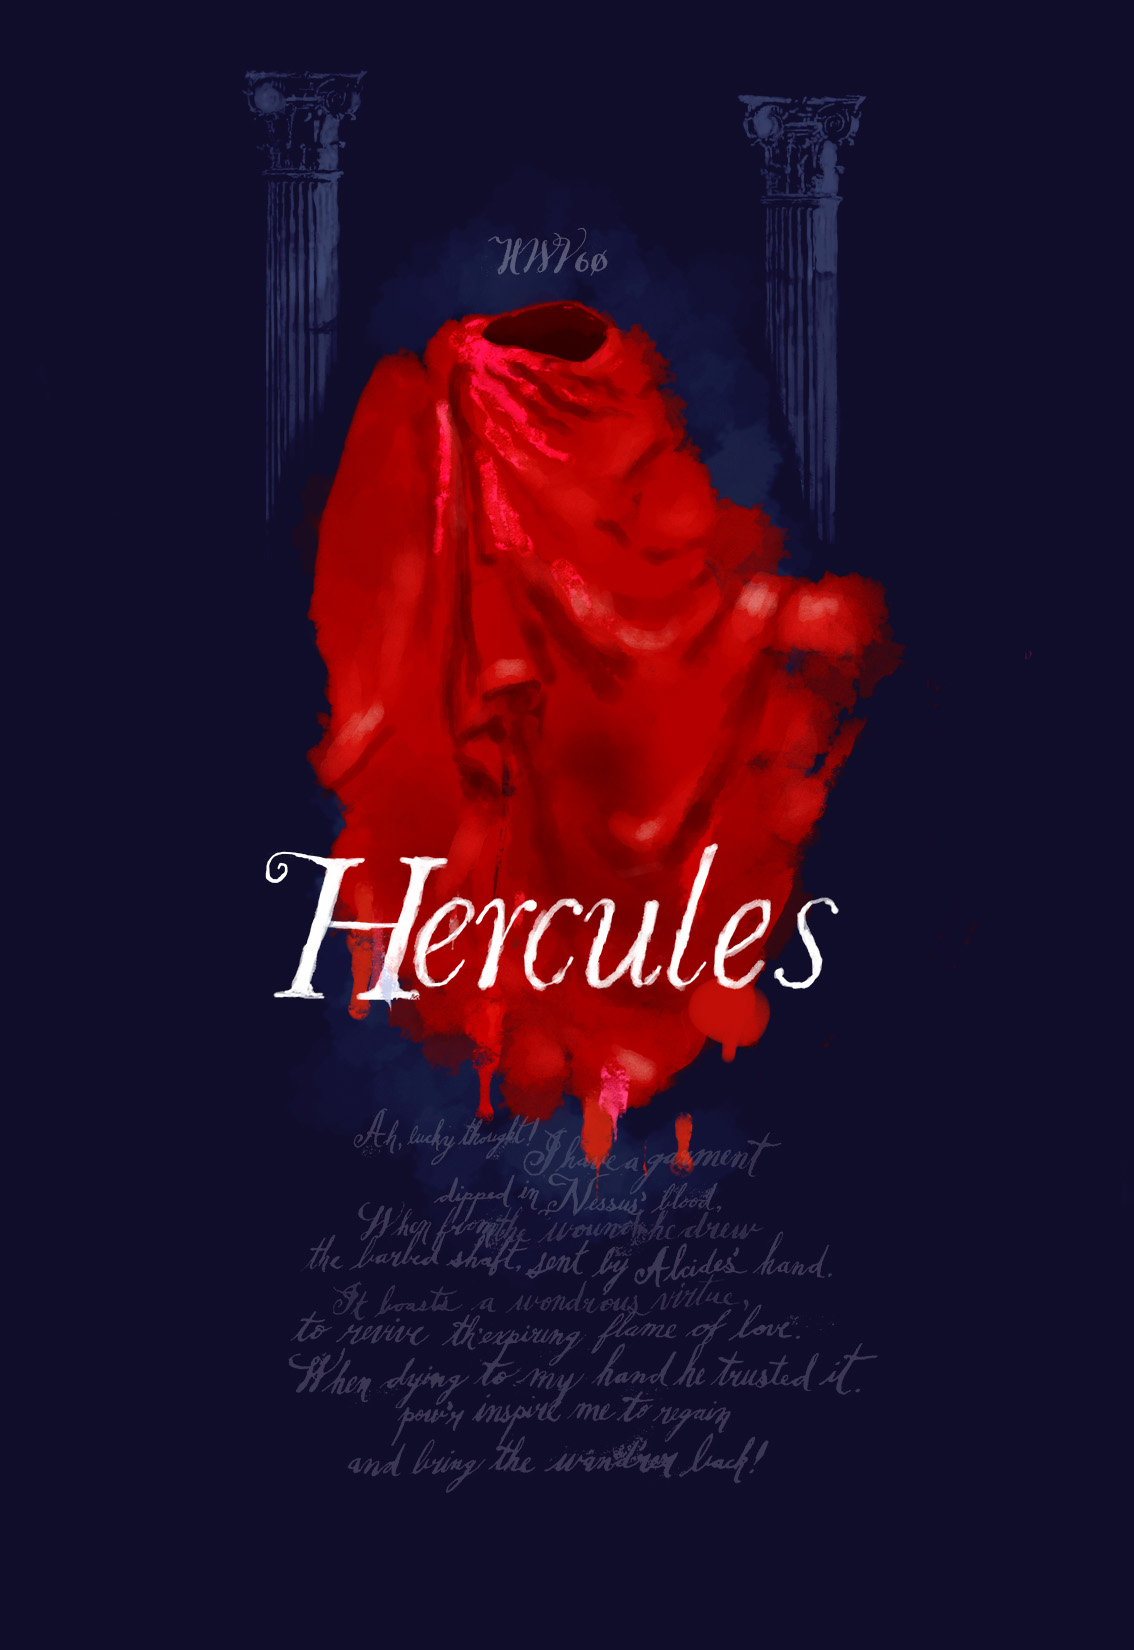 Hercules student artwork from MassArt, Davidson